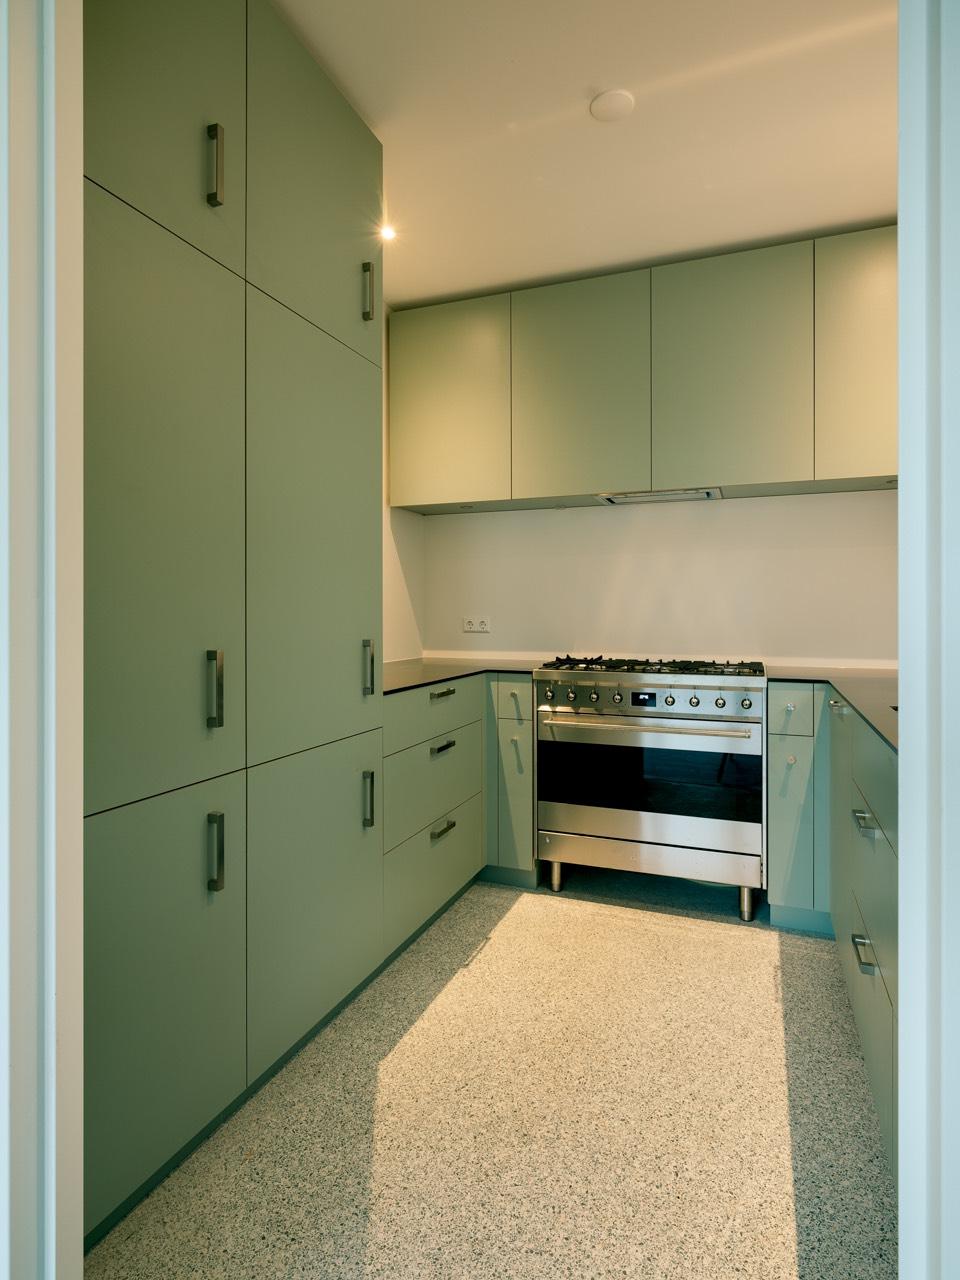 kolenkit-evelijn-ferwerda-interieur-ontwerp-keuken